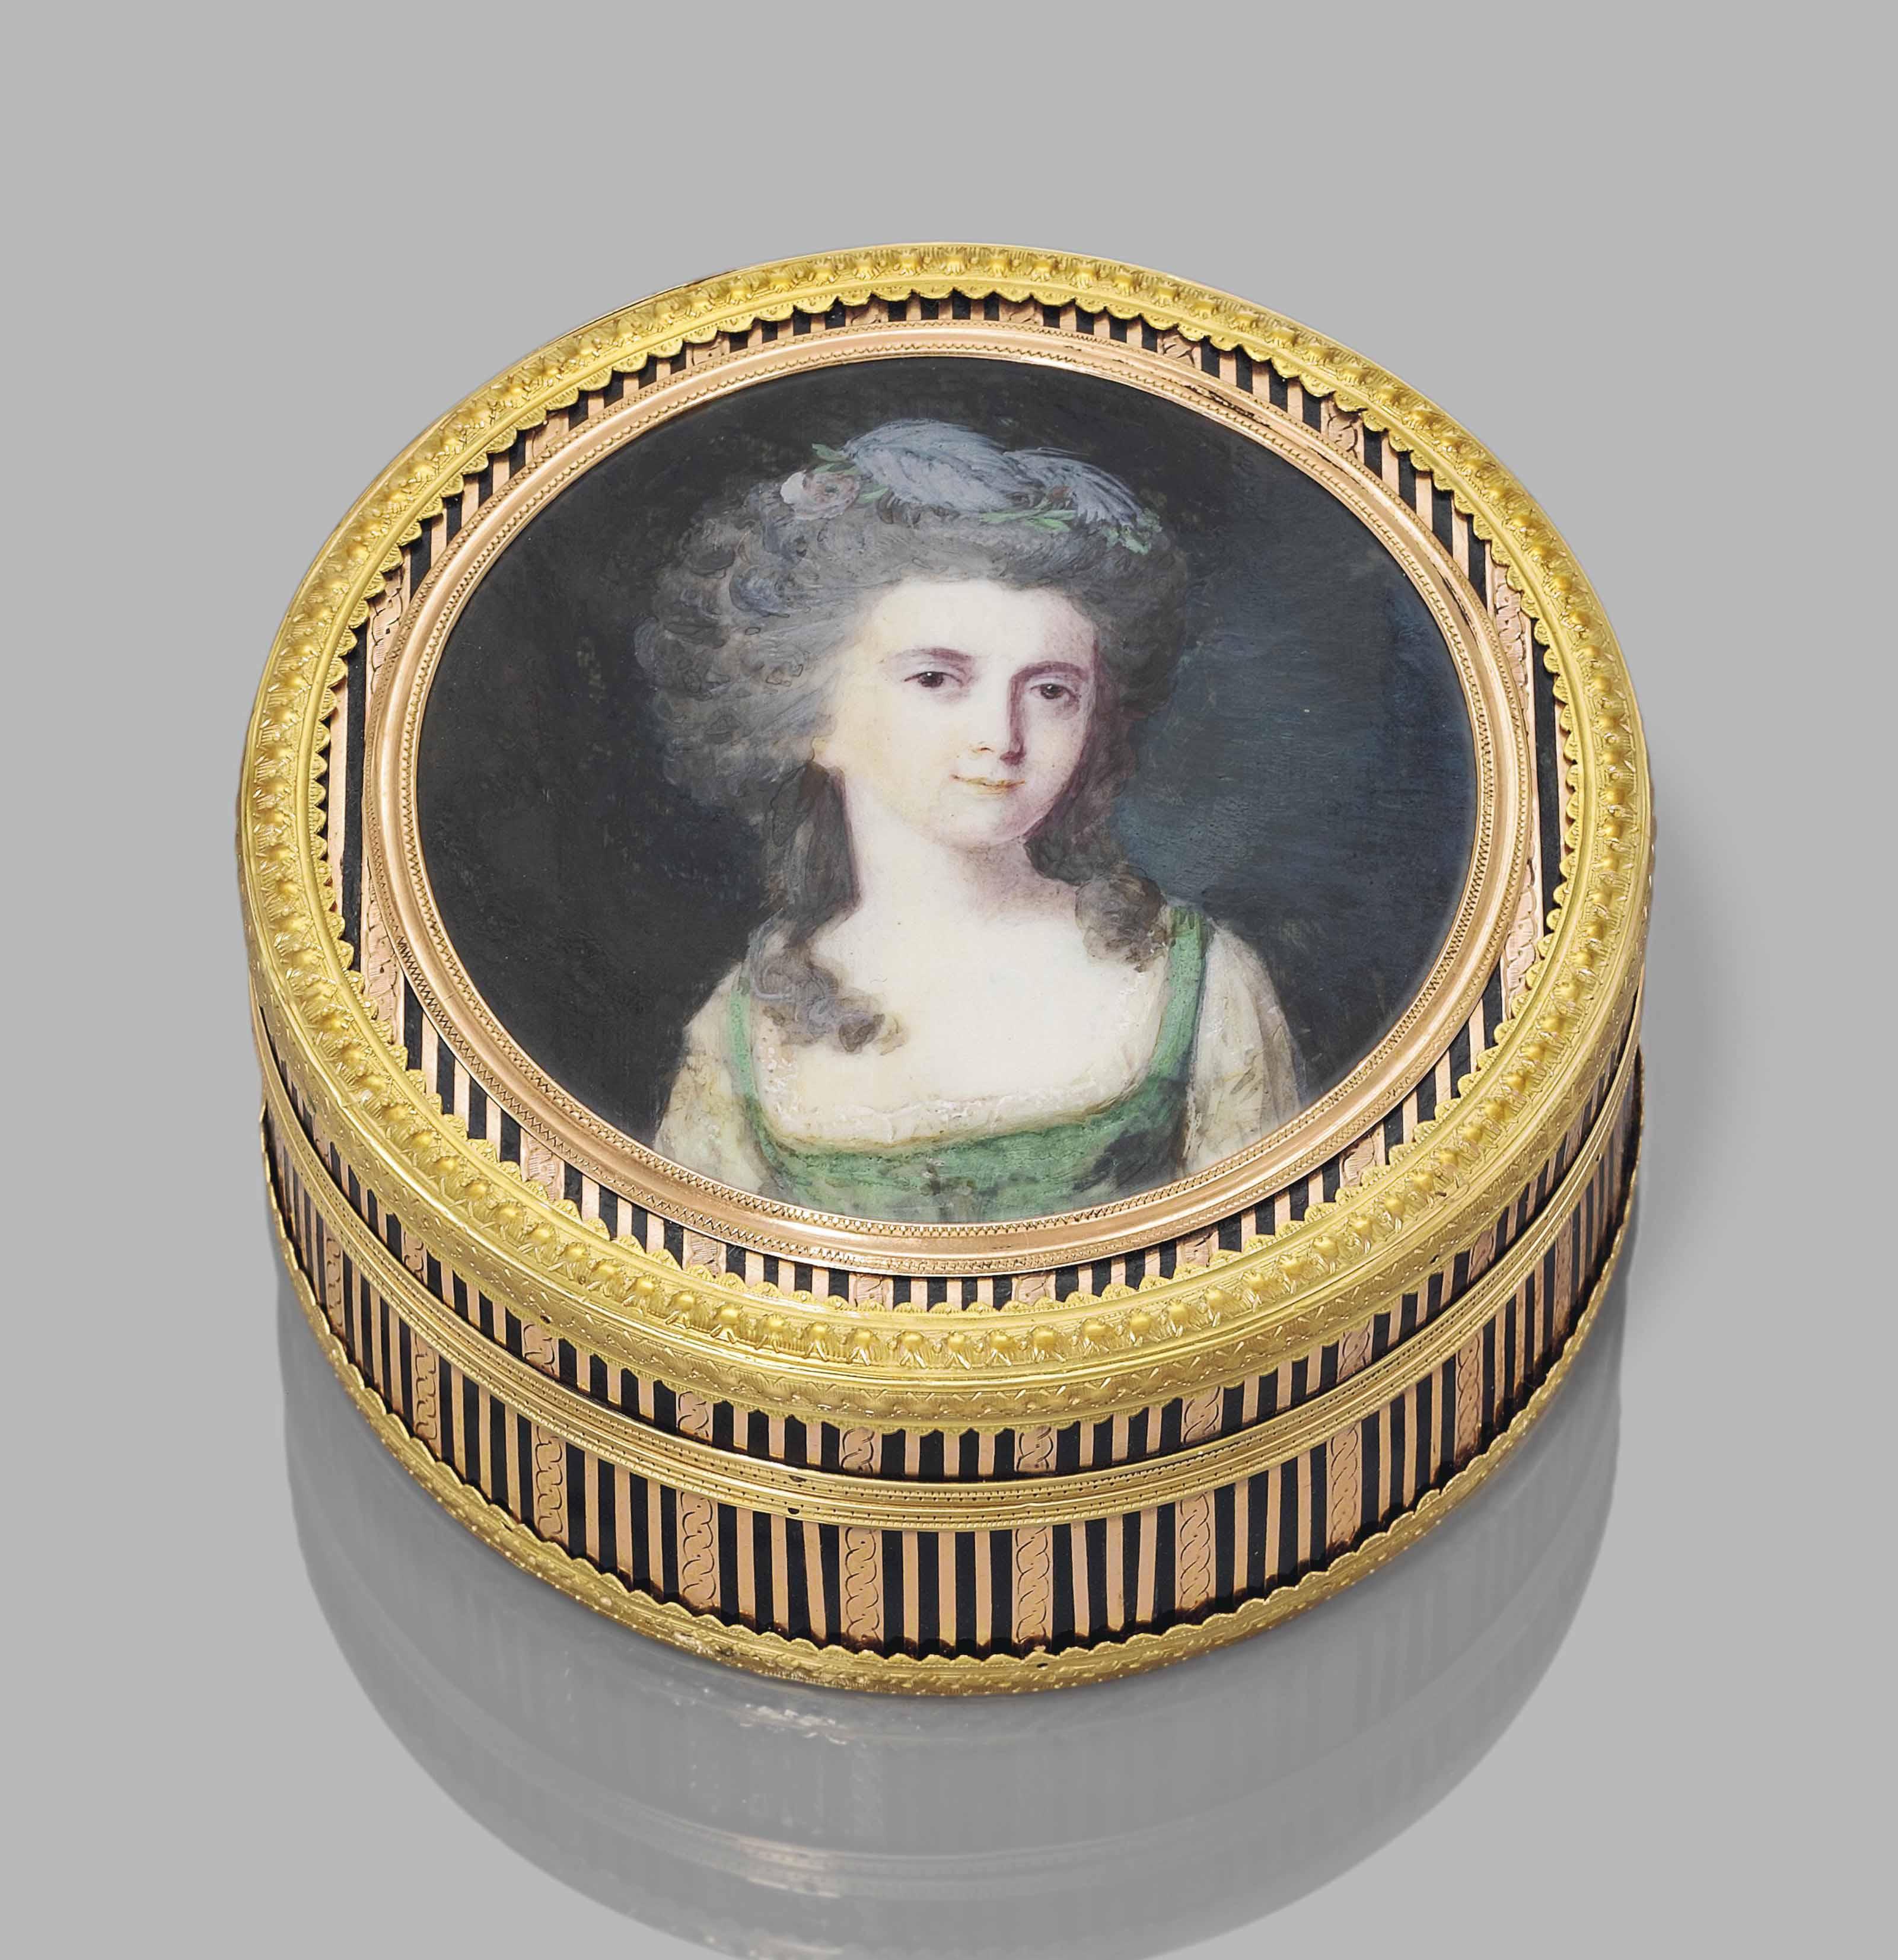 A LOUIS XVI GOLD-MOUNTED TORTO